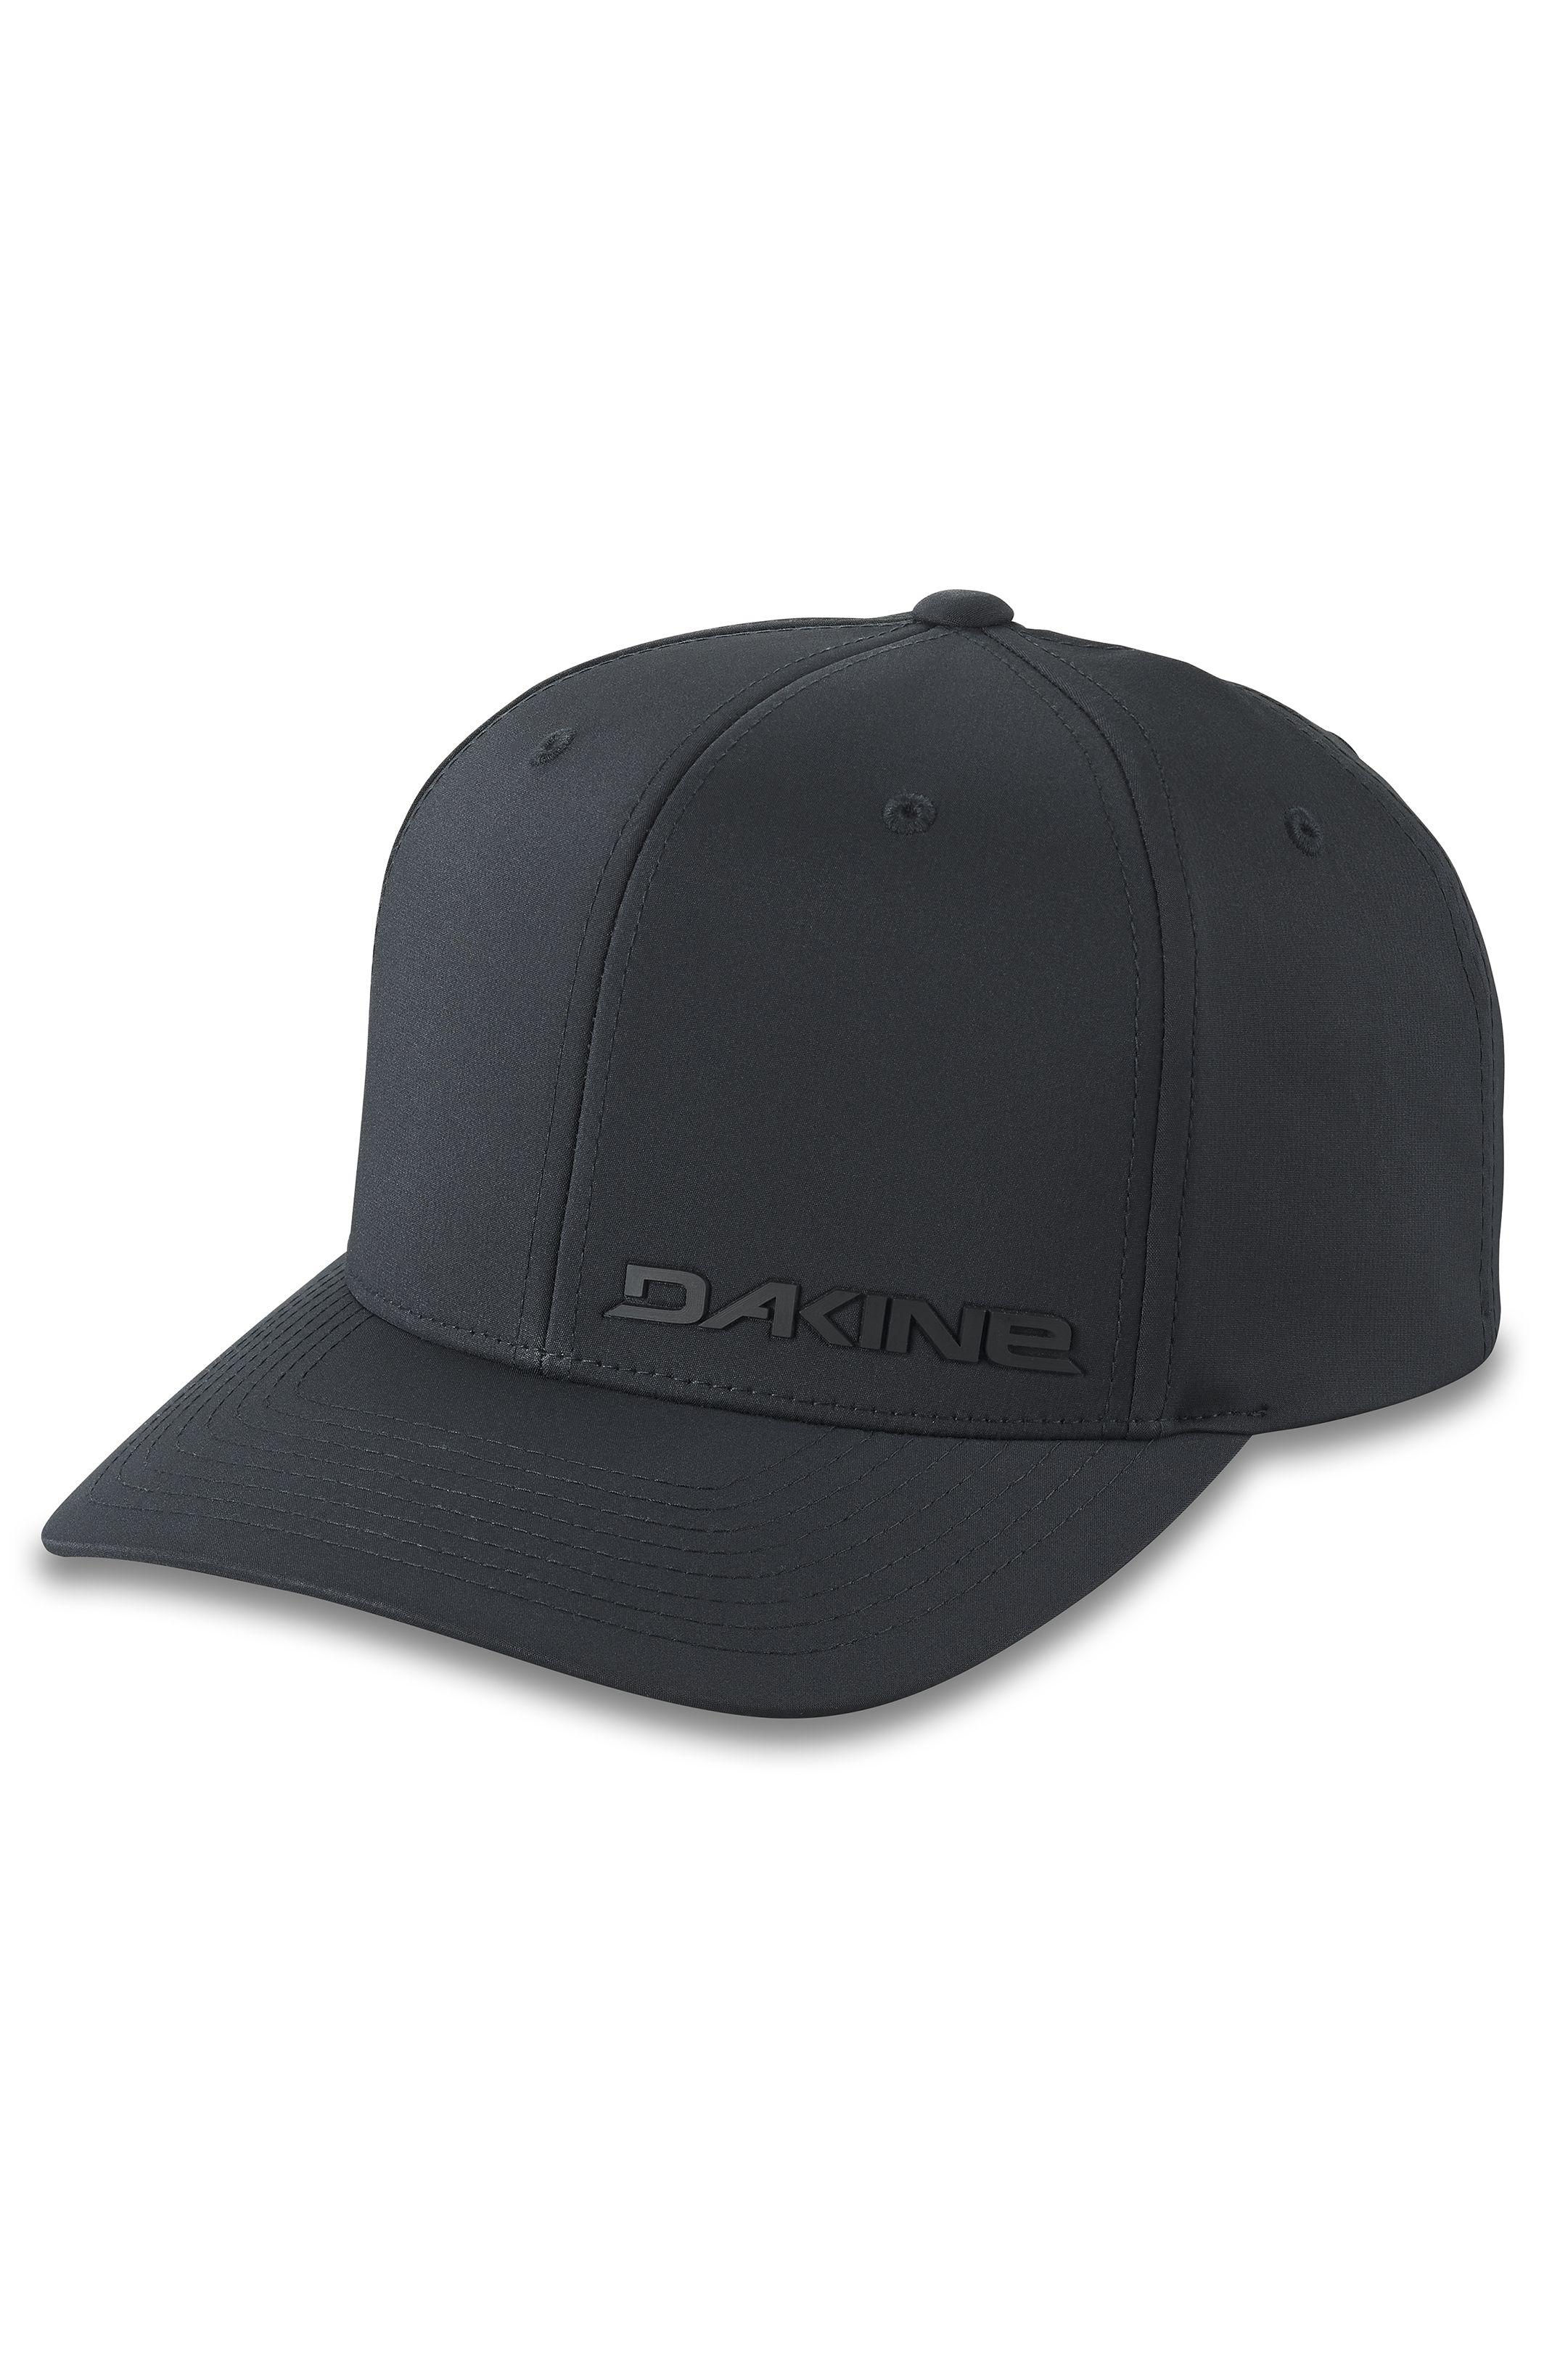 Dakine Cap   RAIL BALLCAP Black